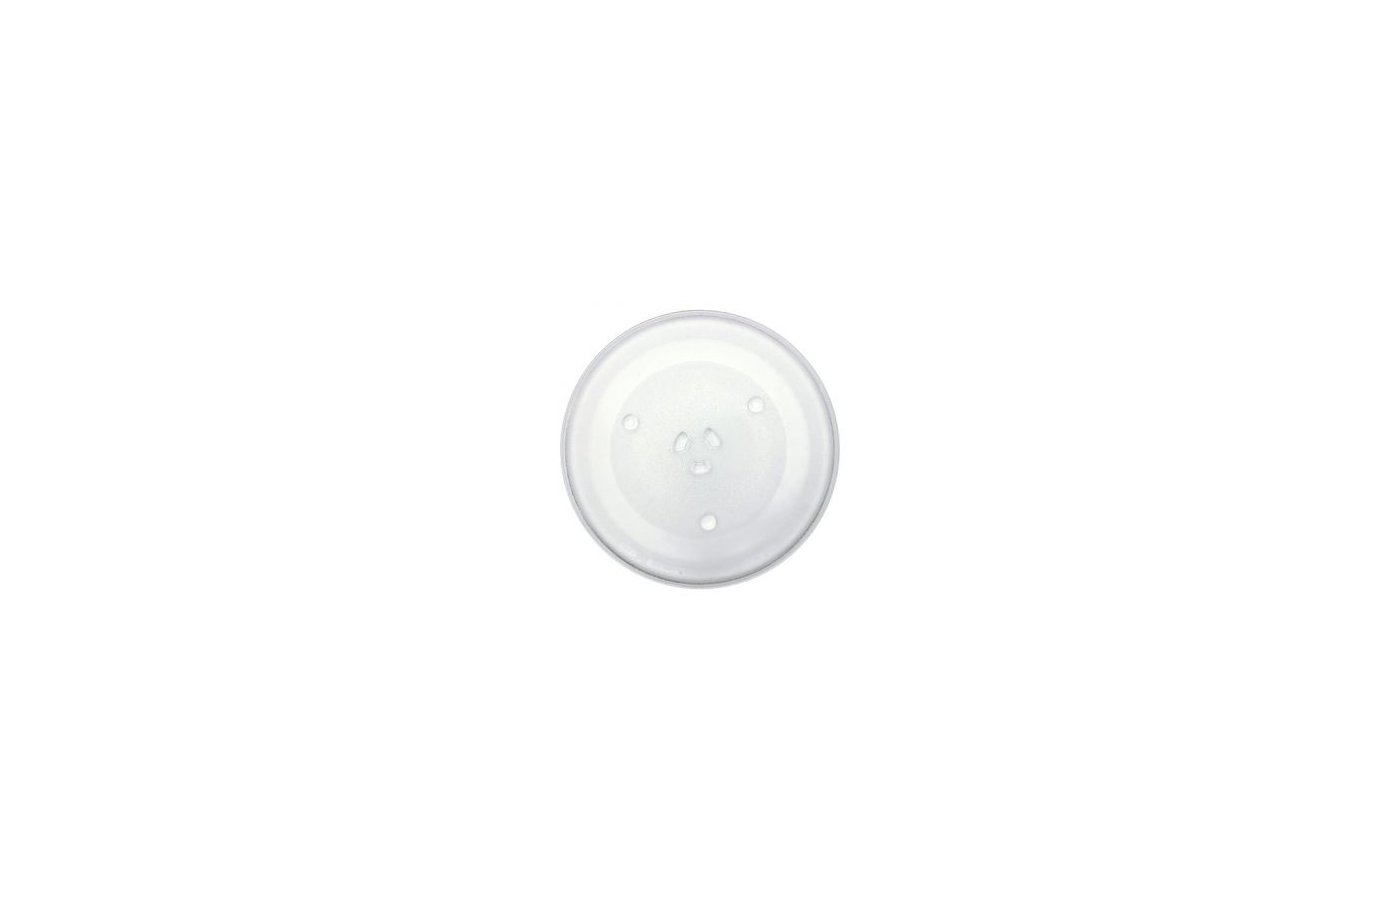 Тарелка для СВЧ AKSEL/EURO EUR N-06 Тарелка для СВЧ